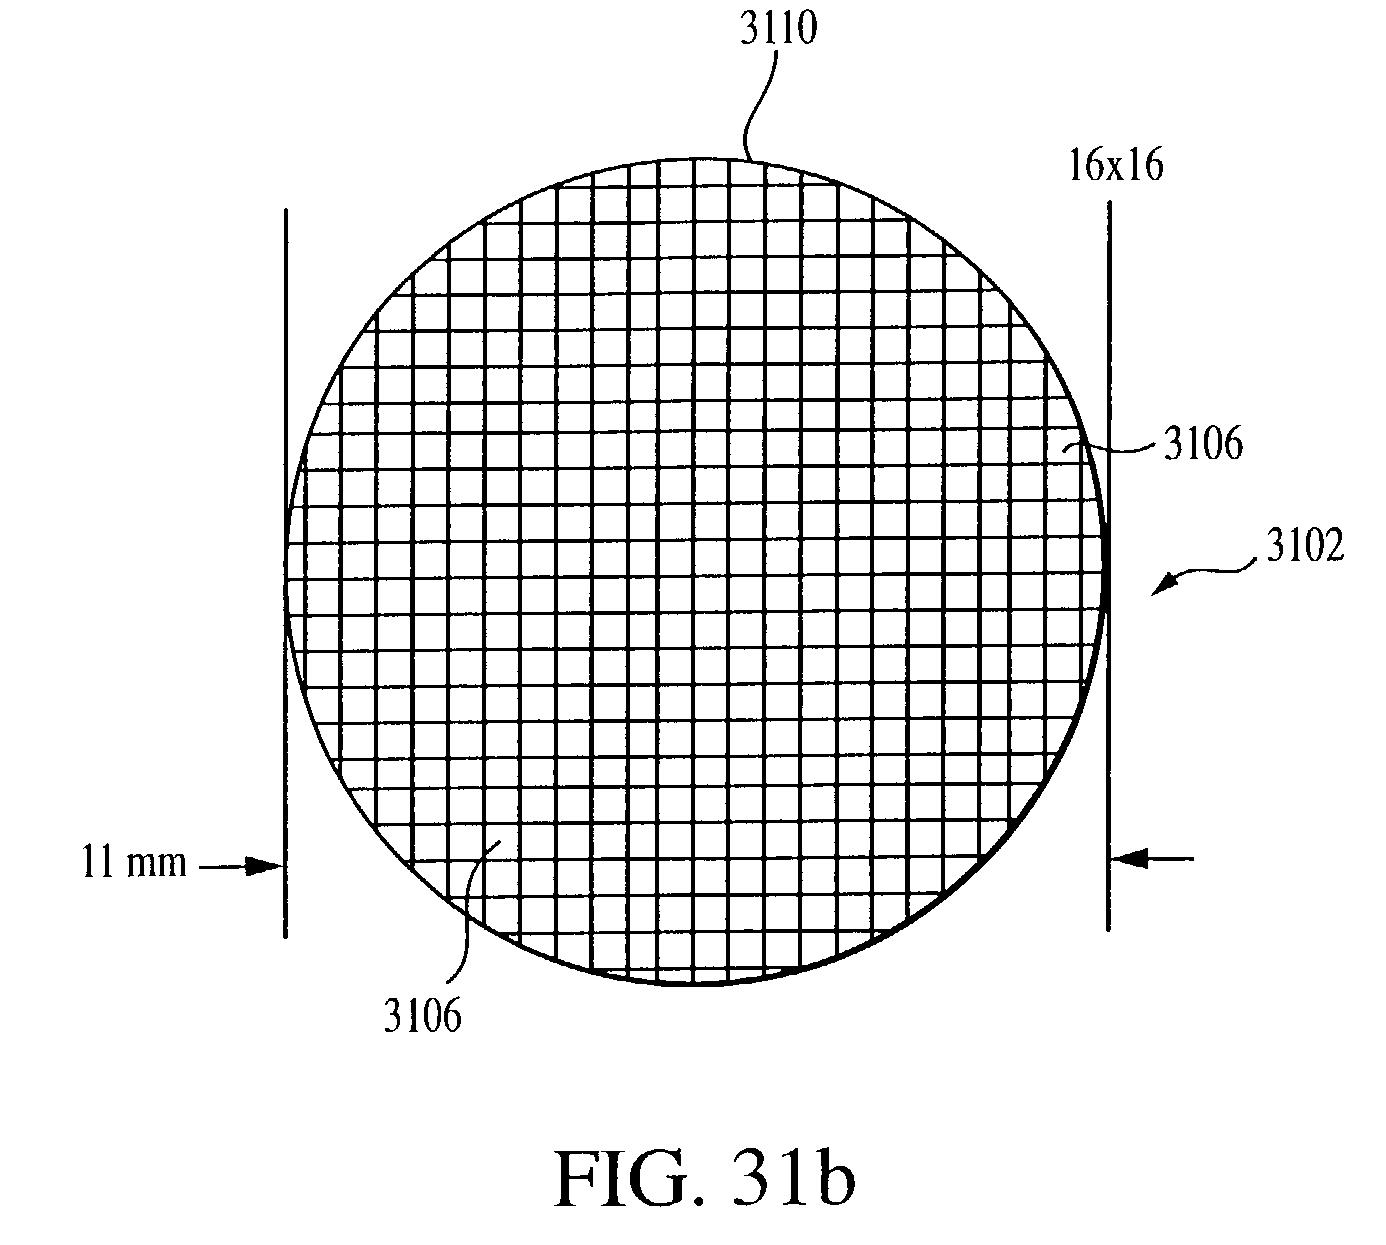 Patent US 7,914,442 B1